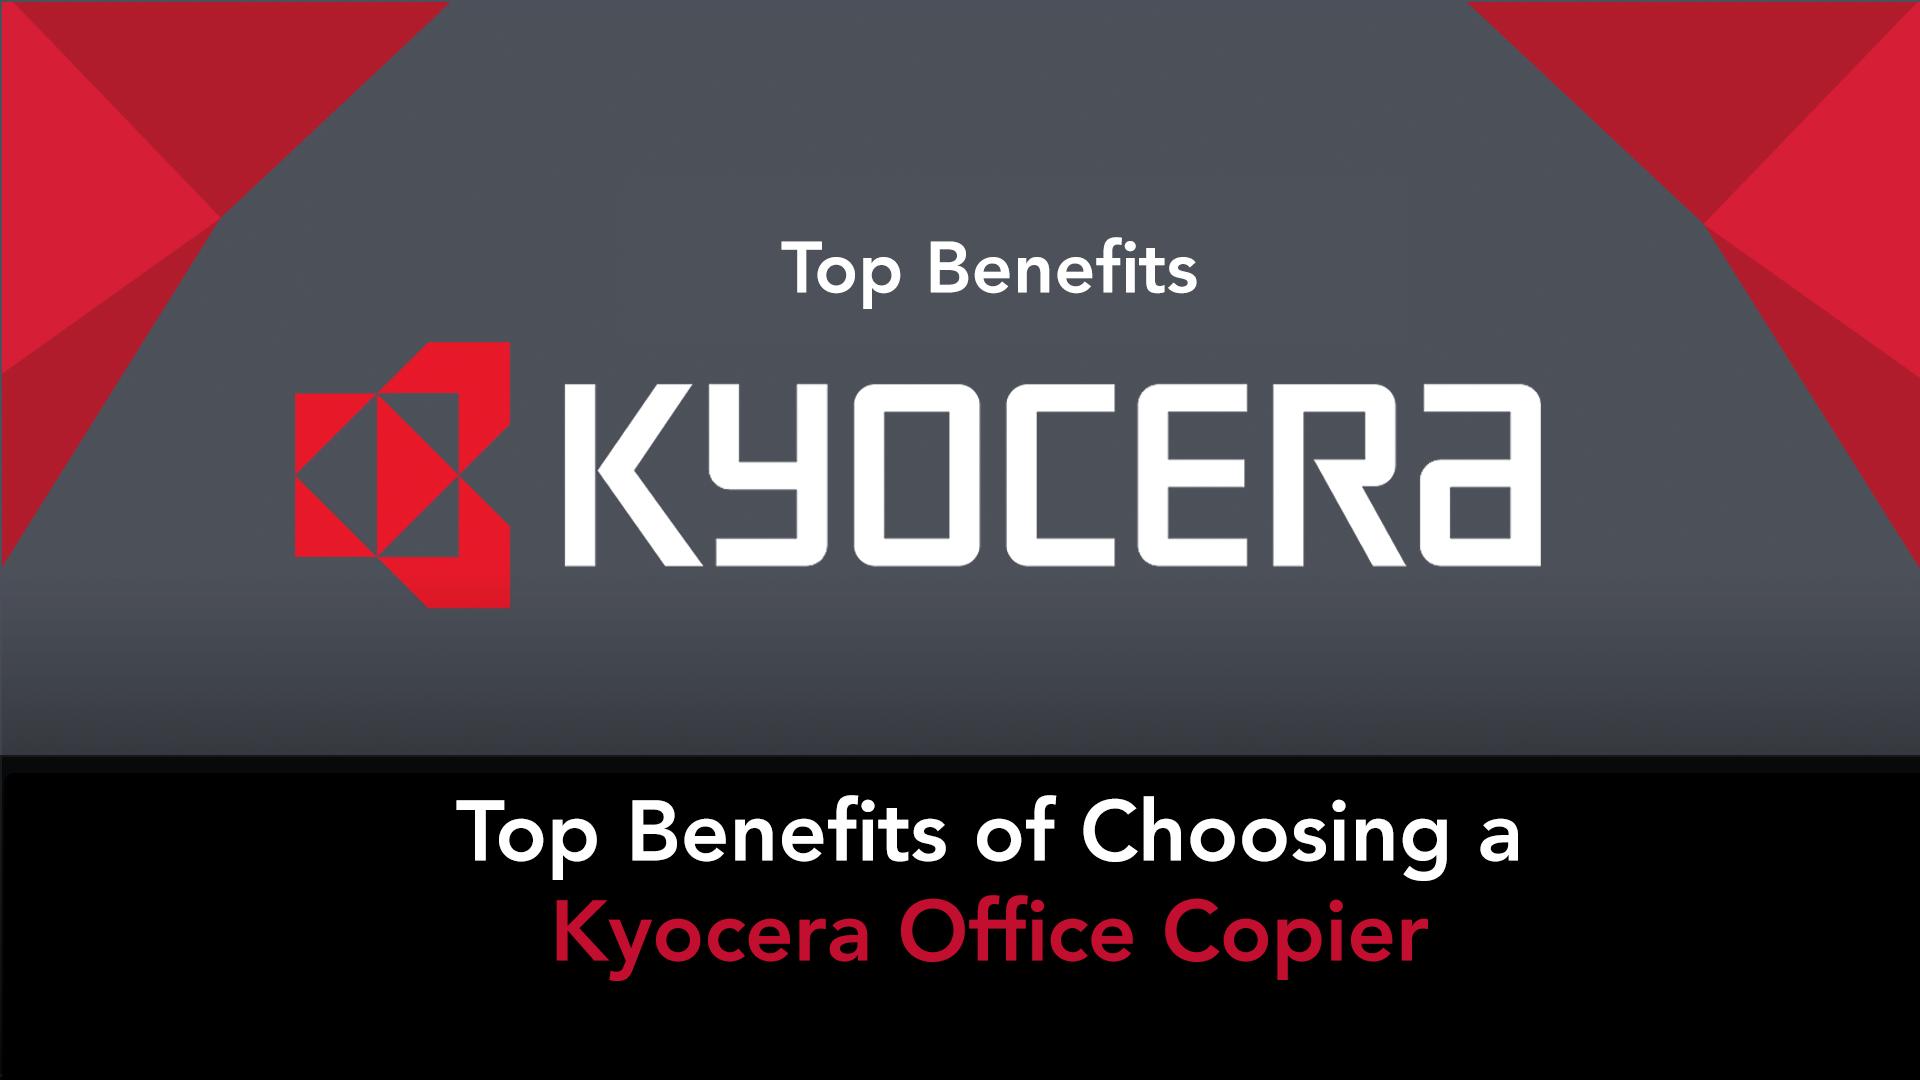 Top Benefits Kyocera